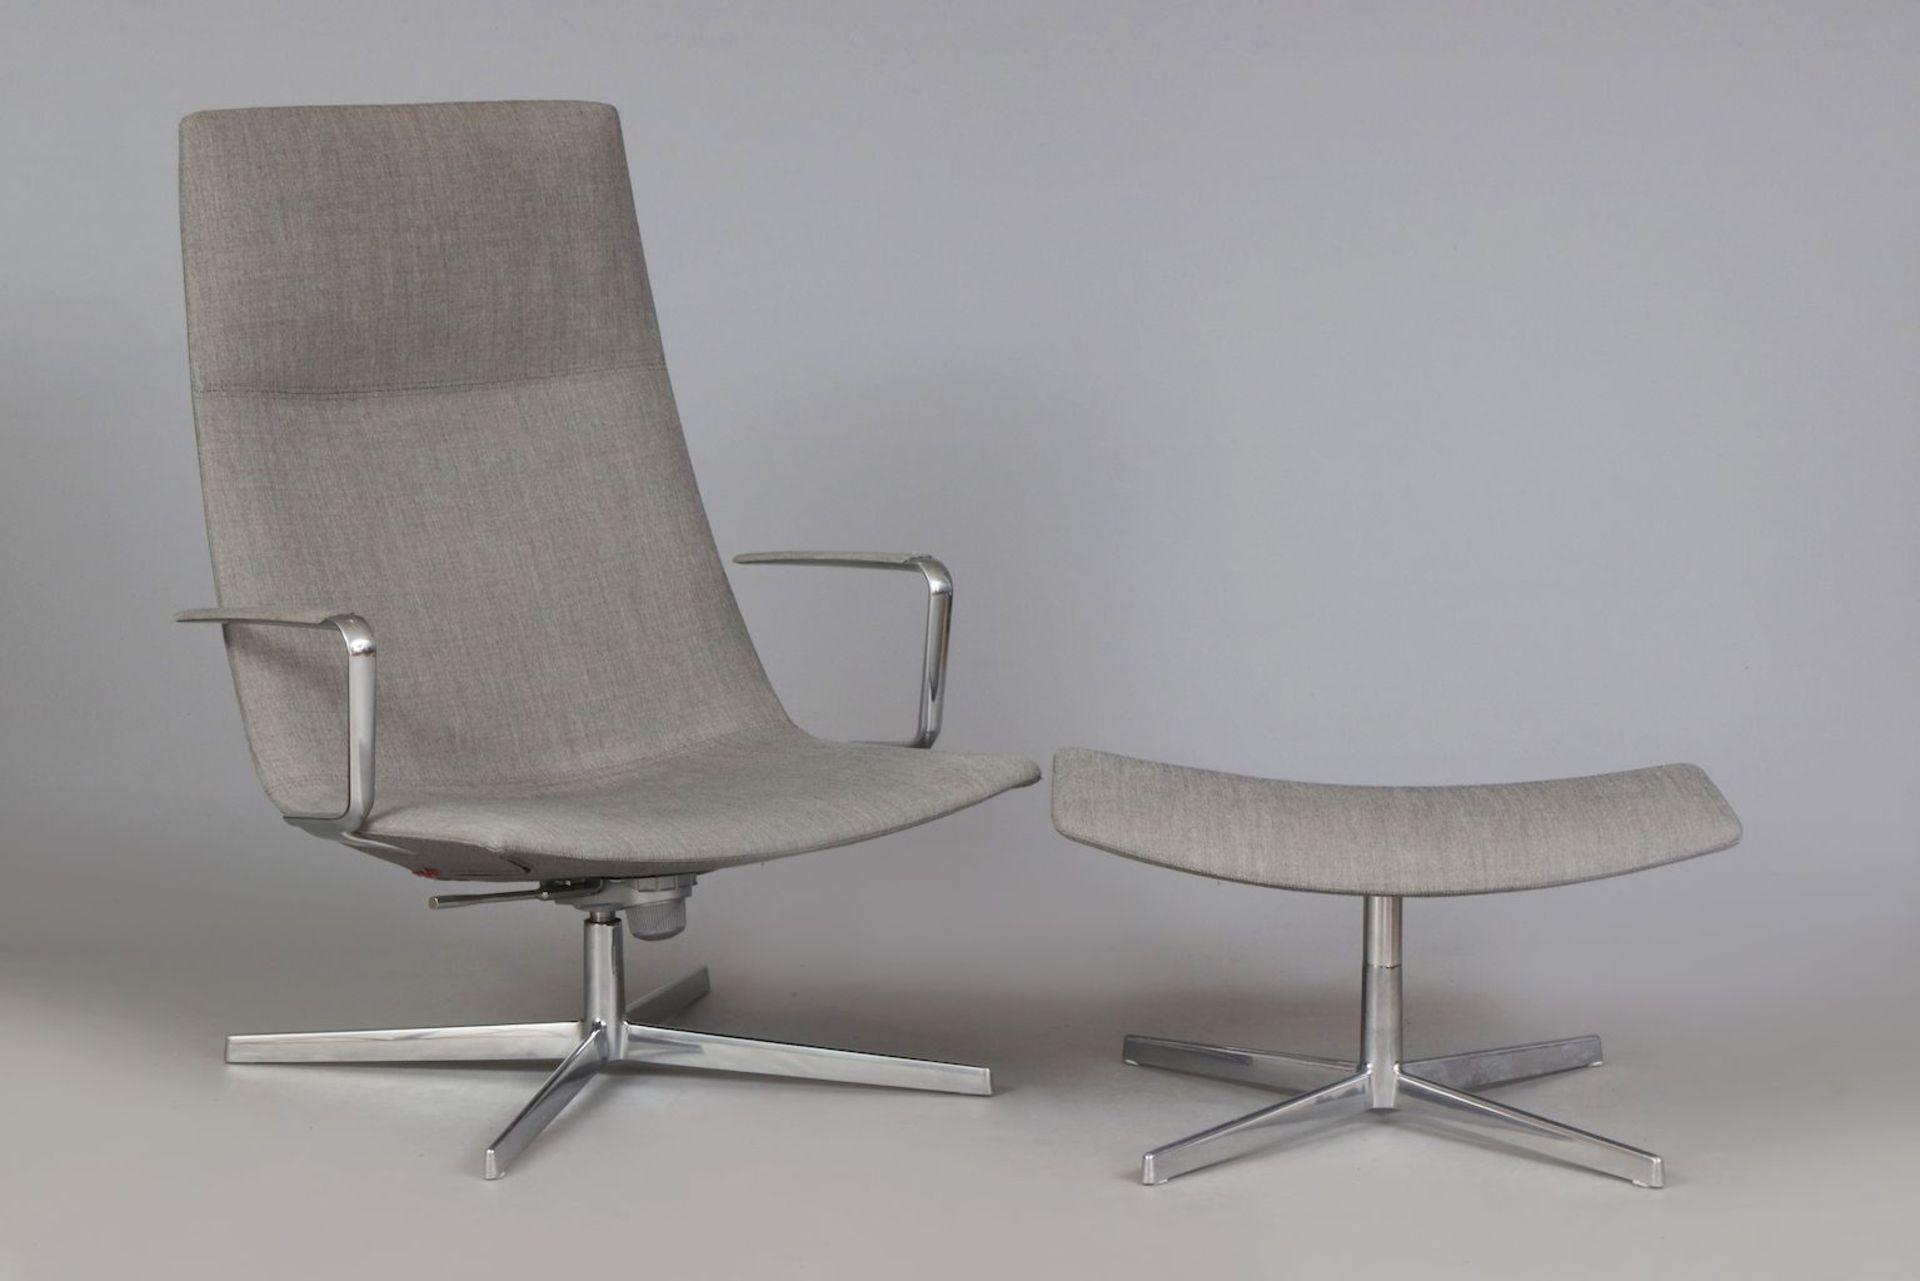 ARPER Italia ¨Catifa 70¨ Lounge chair mit Ottomane - Image 2 of 5